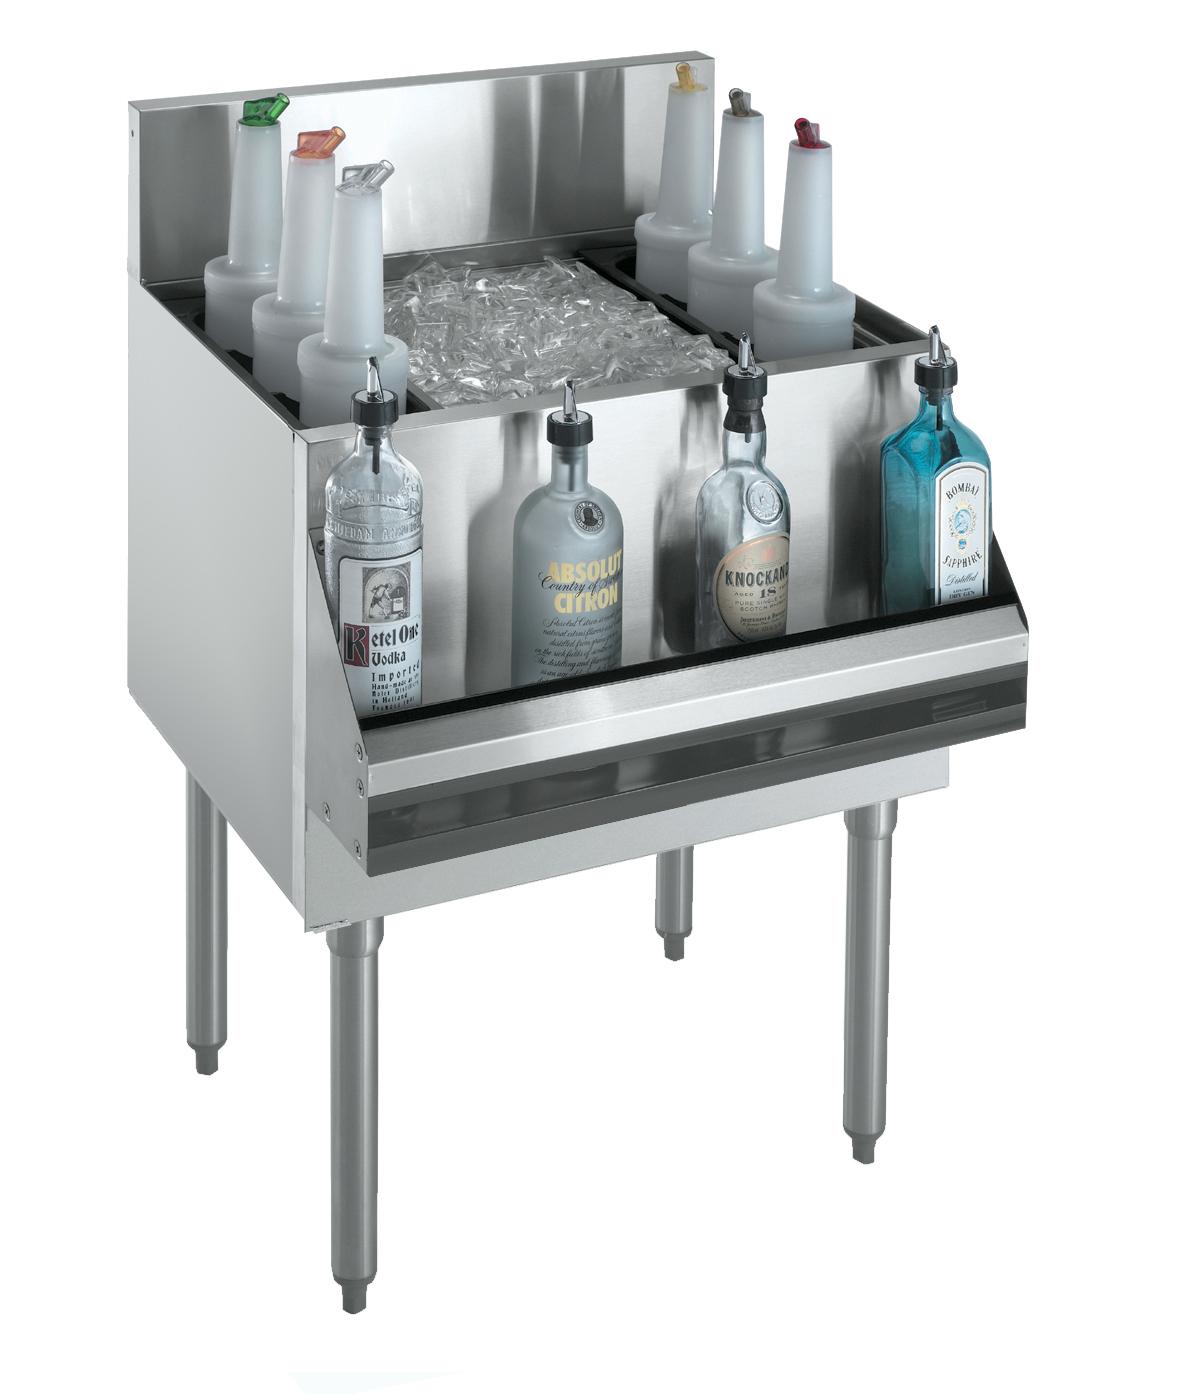 Krowne Metal KR18-30-10 underbar ice bin/cocktail unit